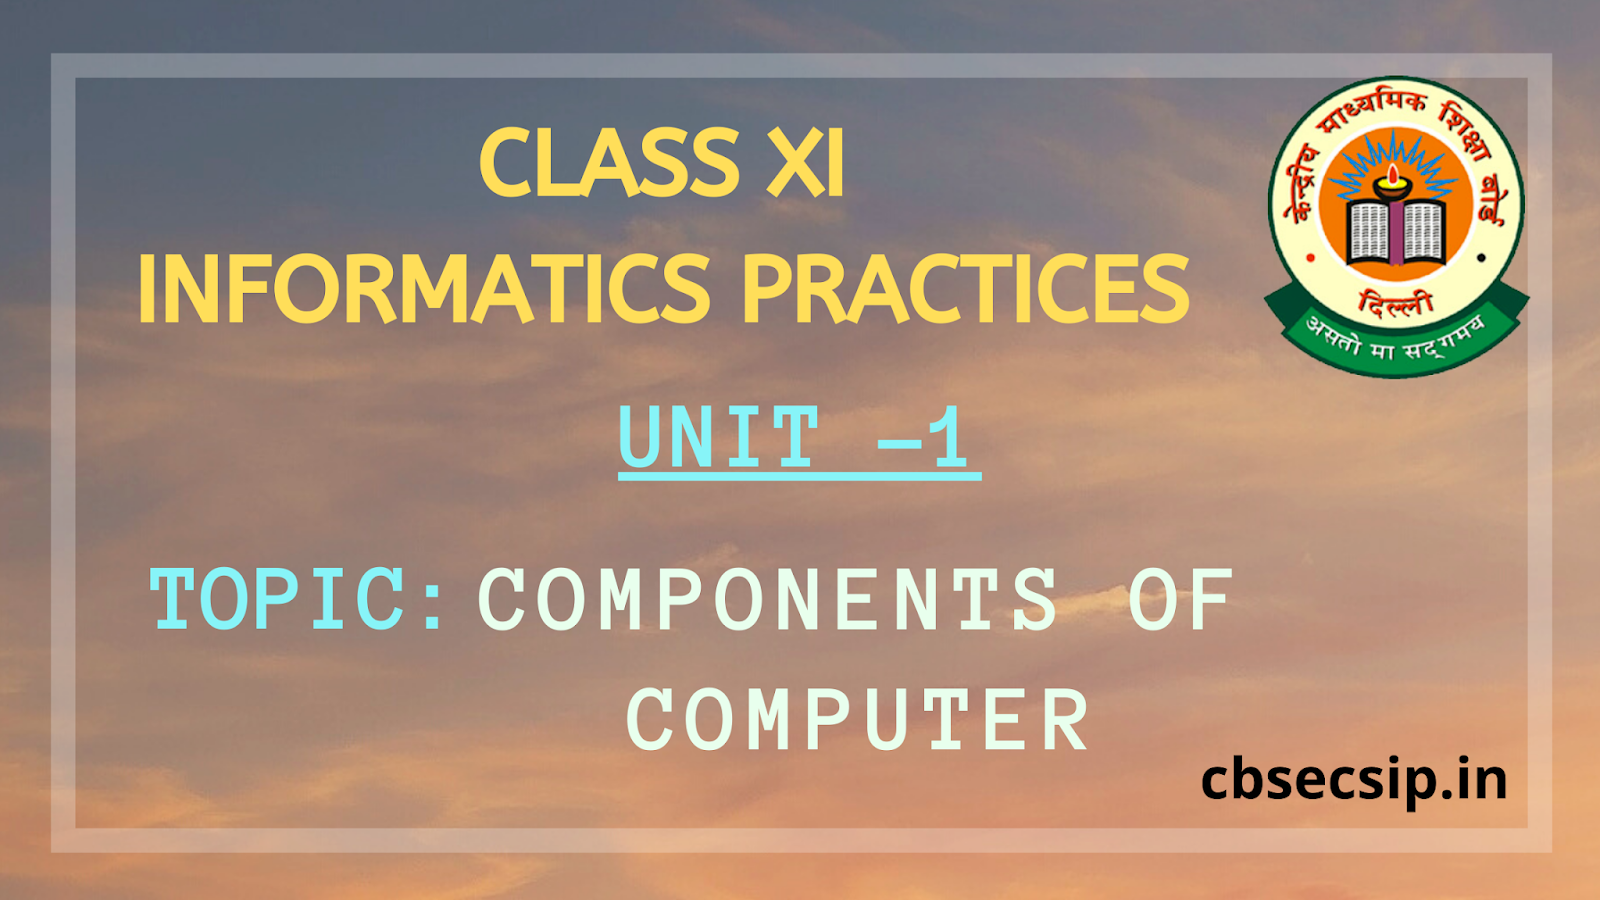 components of computer CLASS XI INFORMATICS PRACTICES